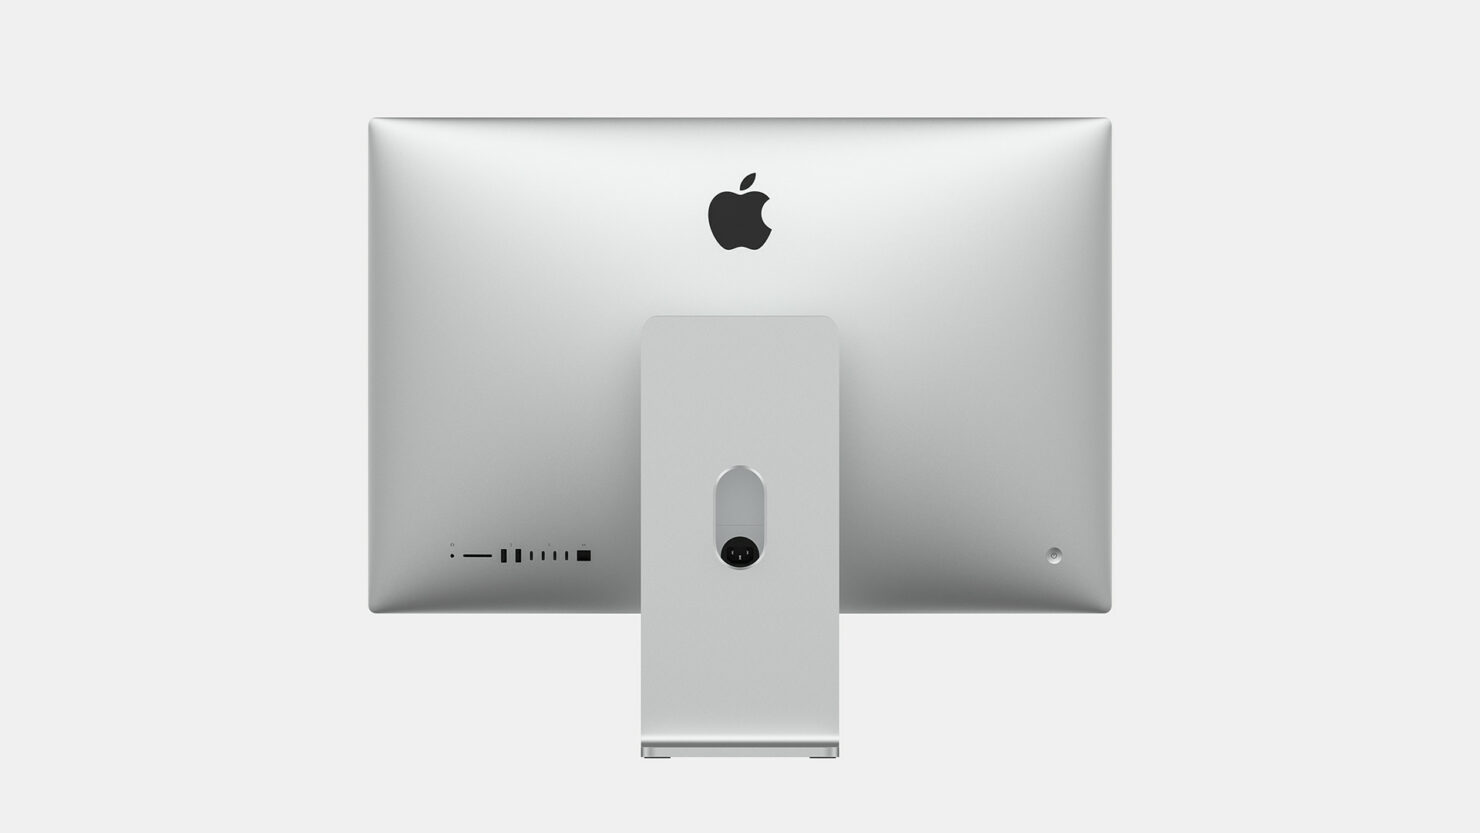 imac-concept-resembling-pro-display-xdr-17